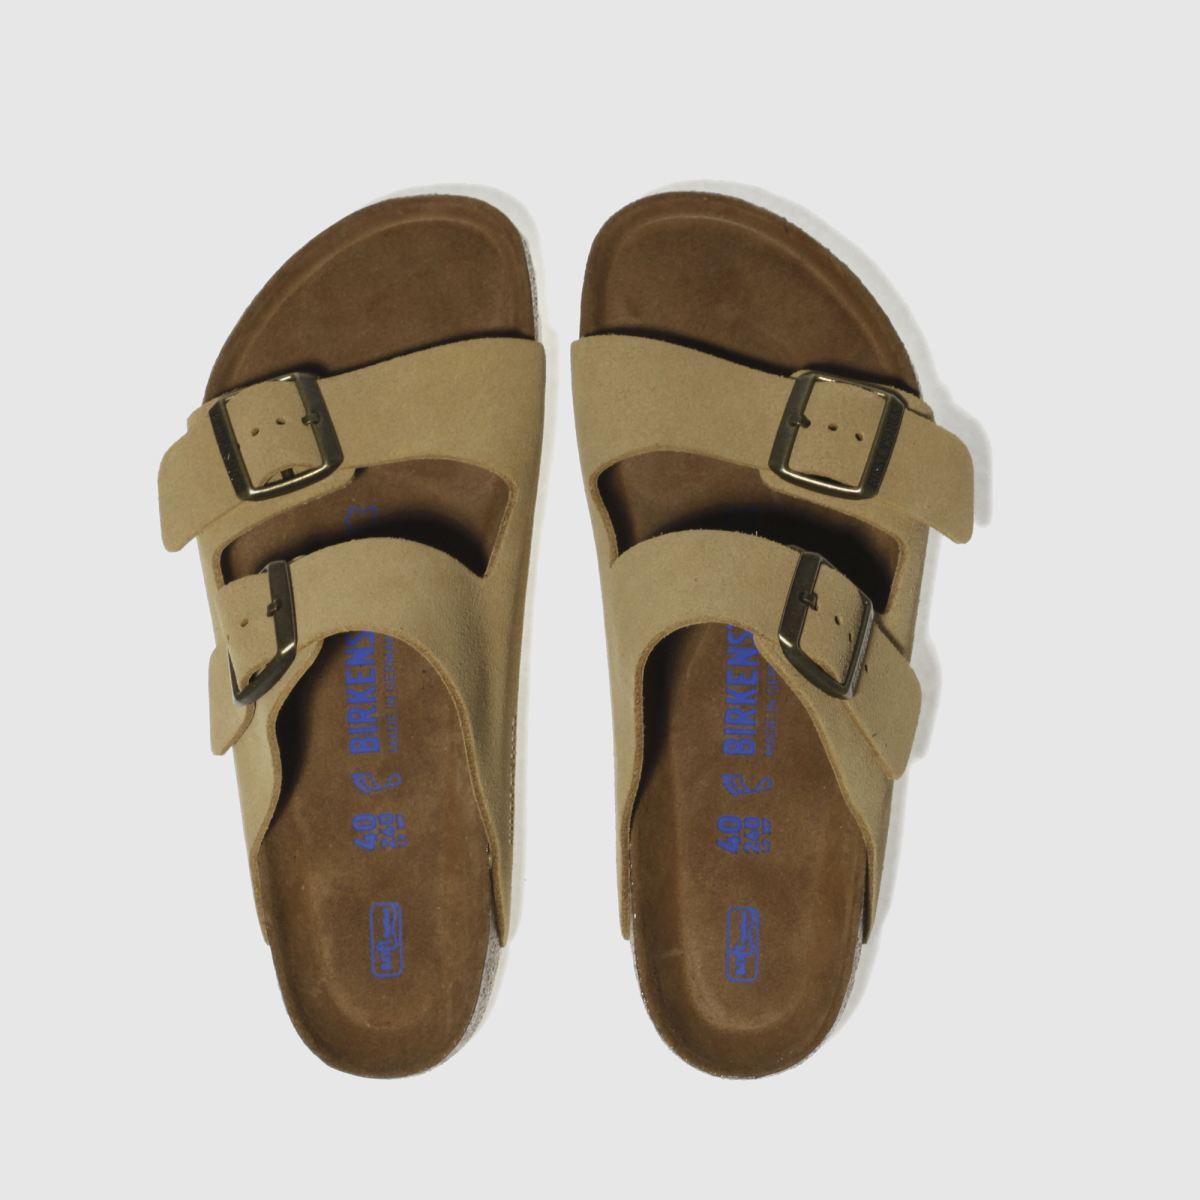 Birkenstock Beige Arizona Soft Footbed Sandals